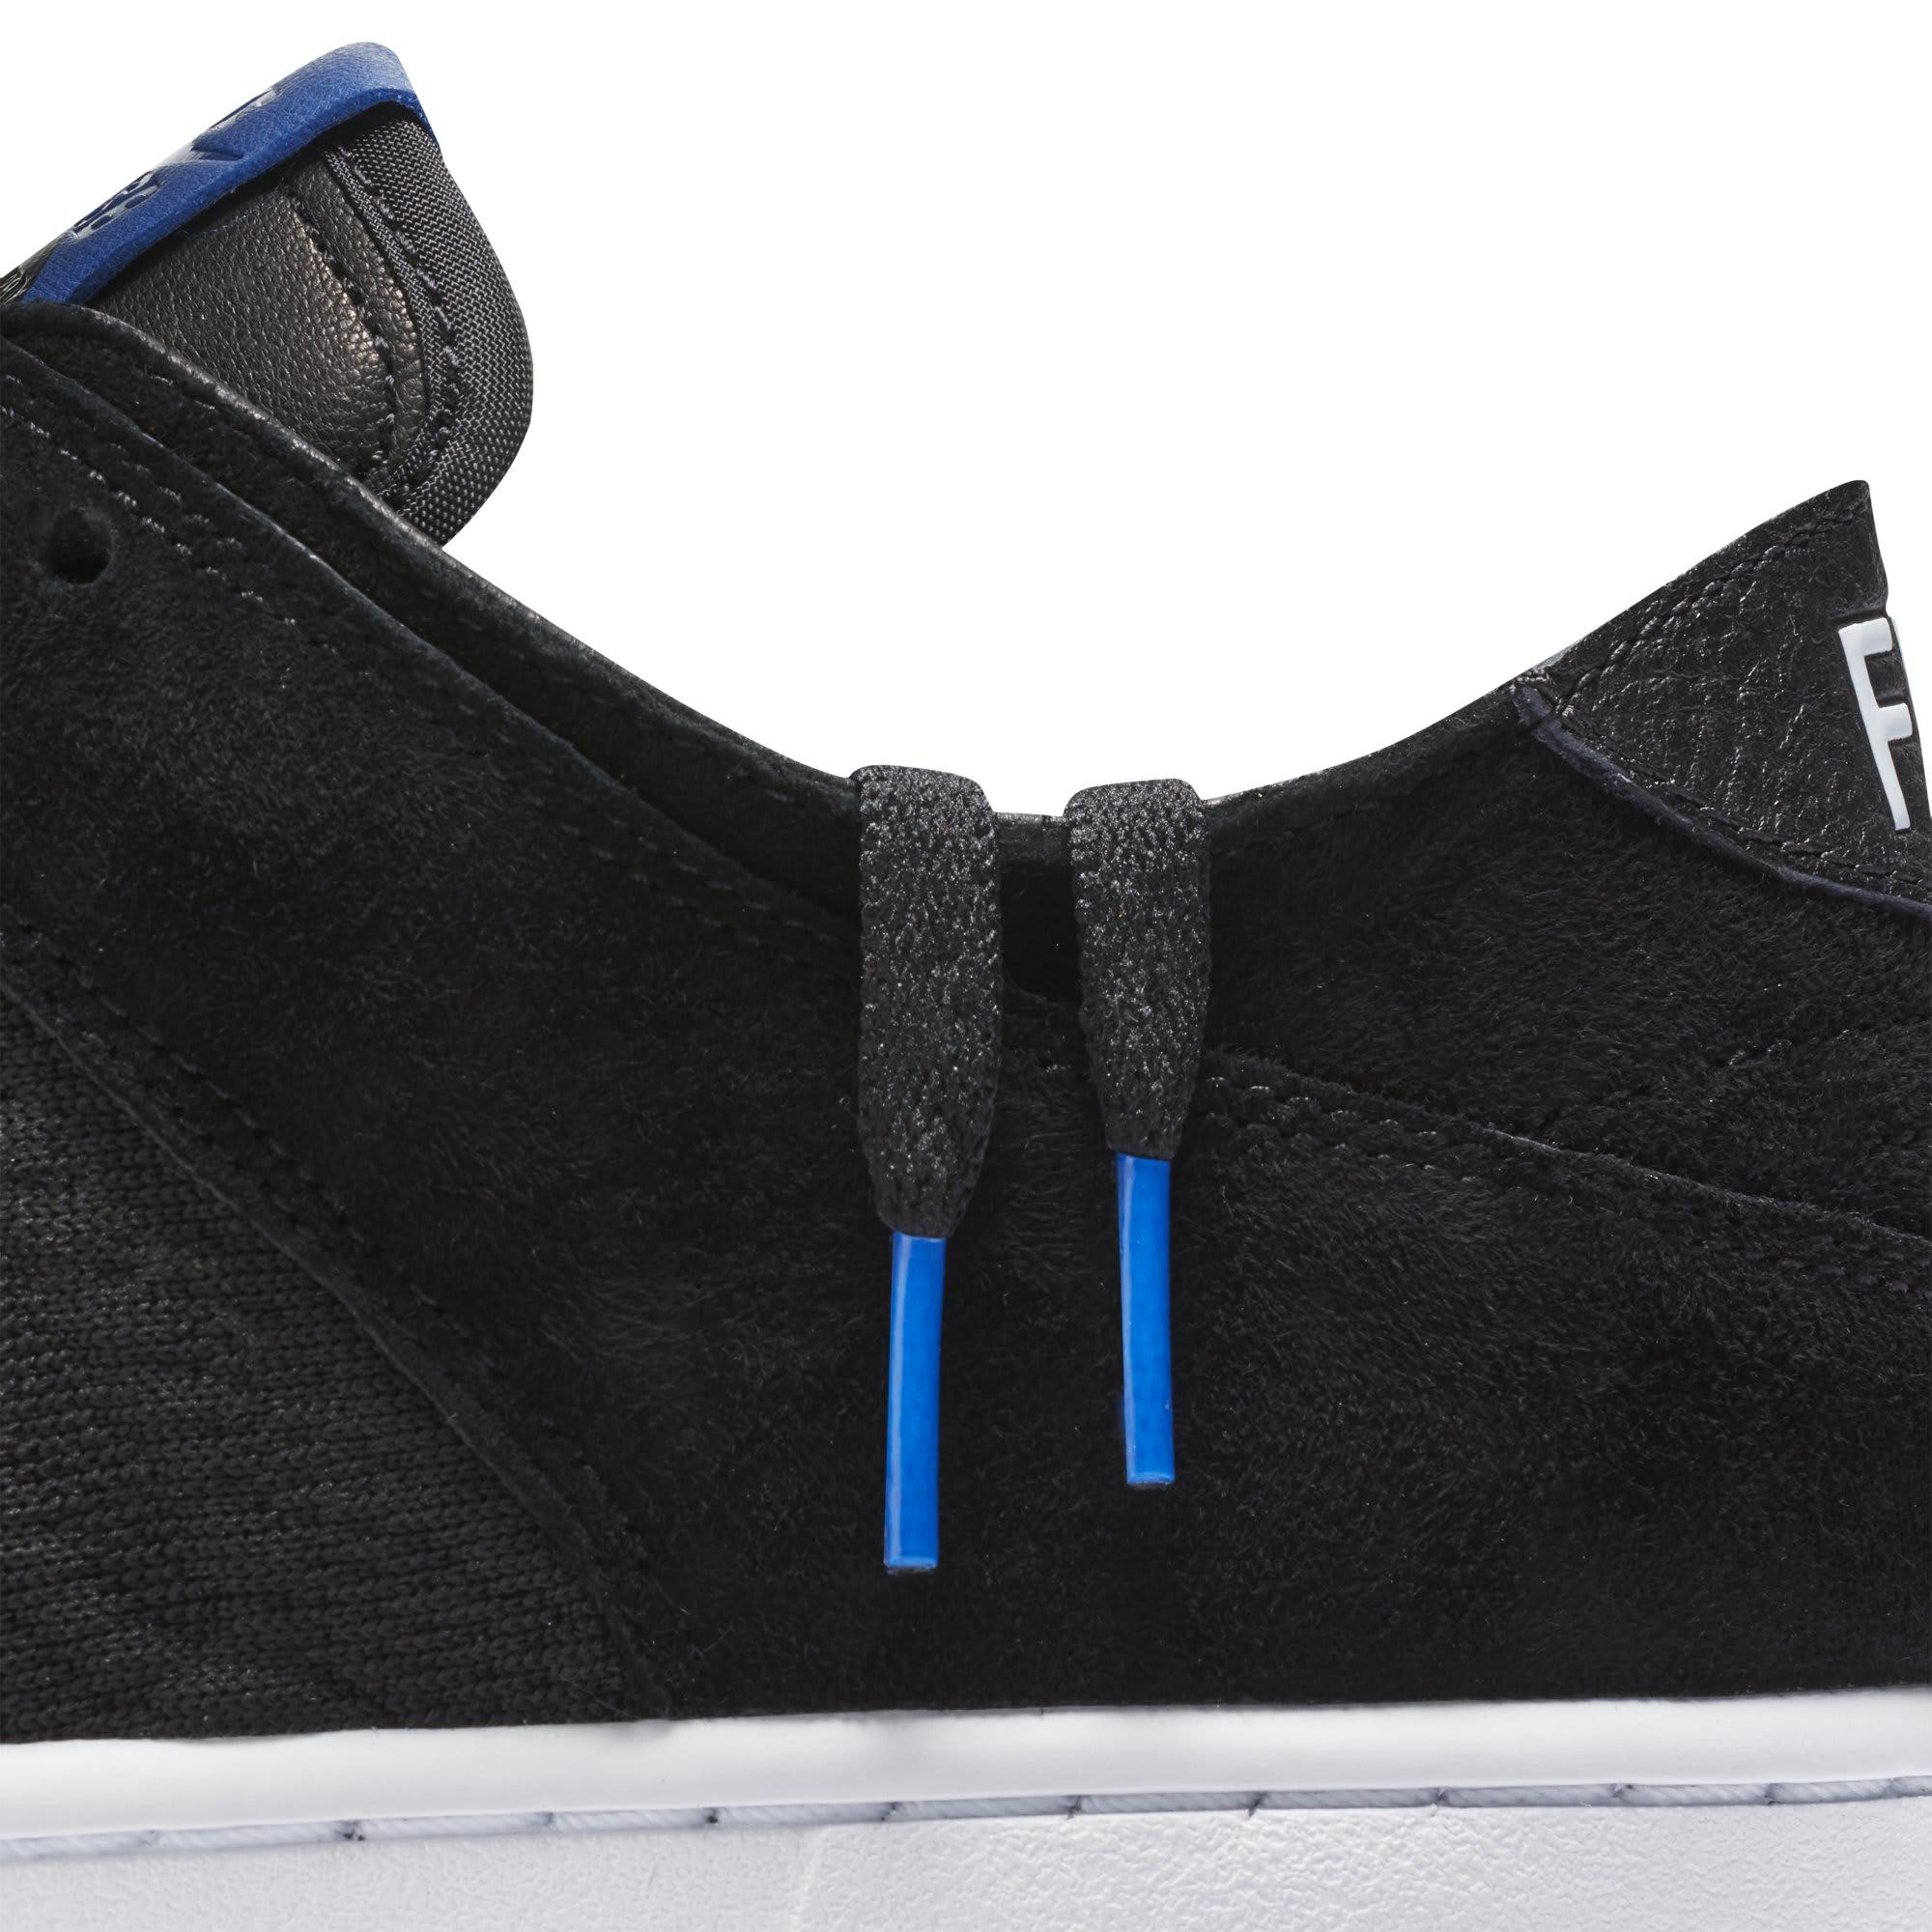 Soulland x Nike SB Dunk Low 918288-041 (Detail)